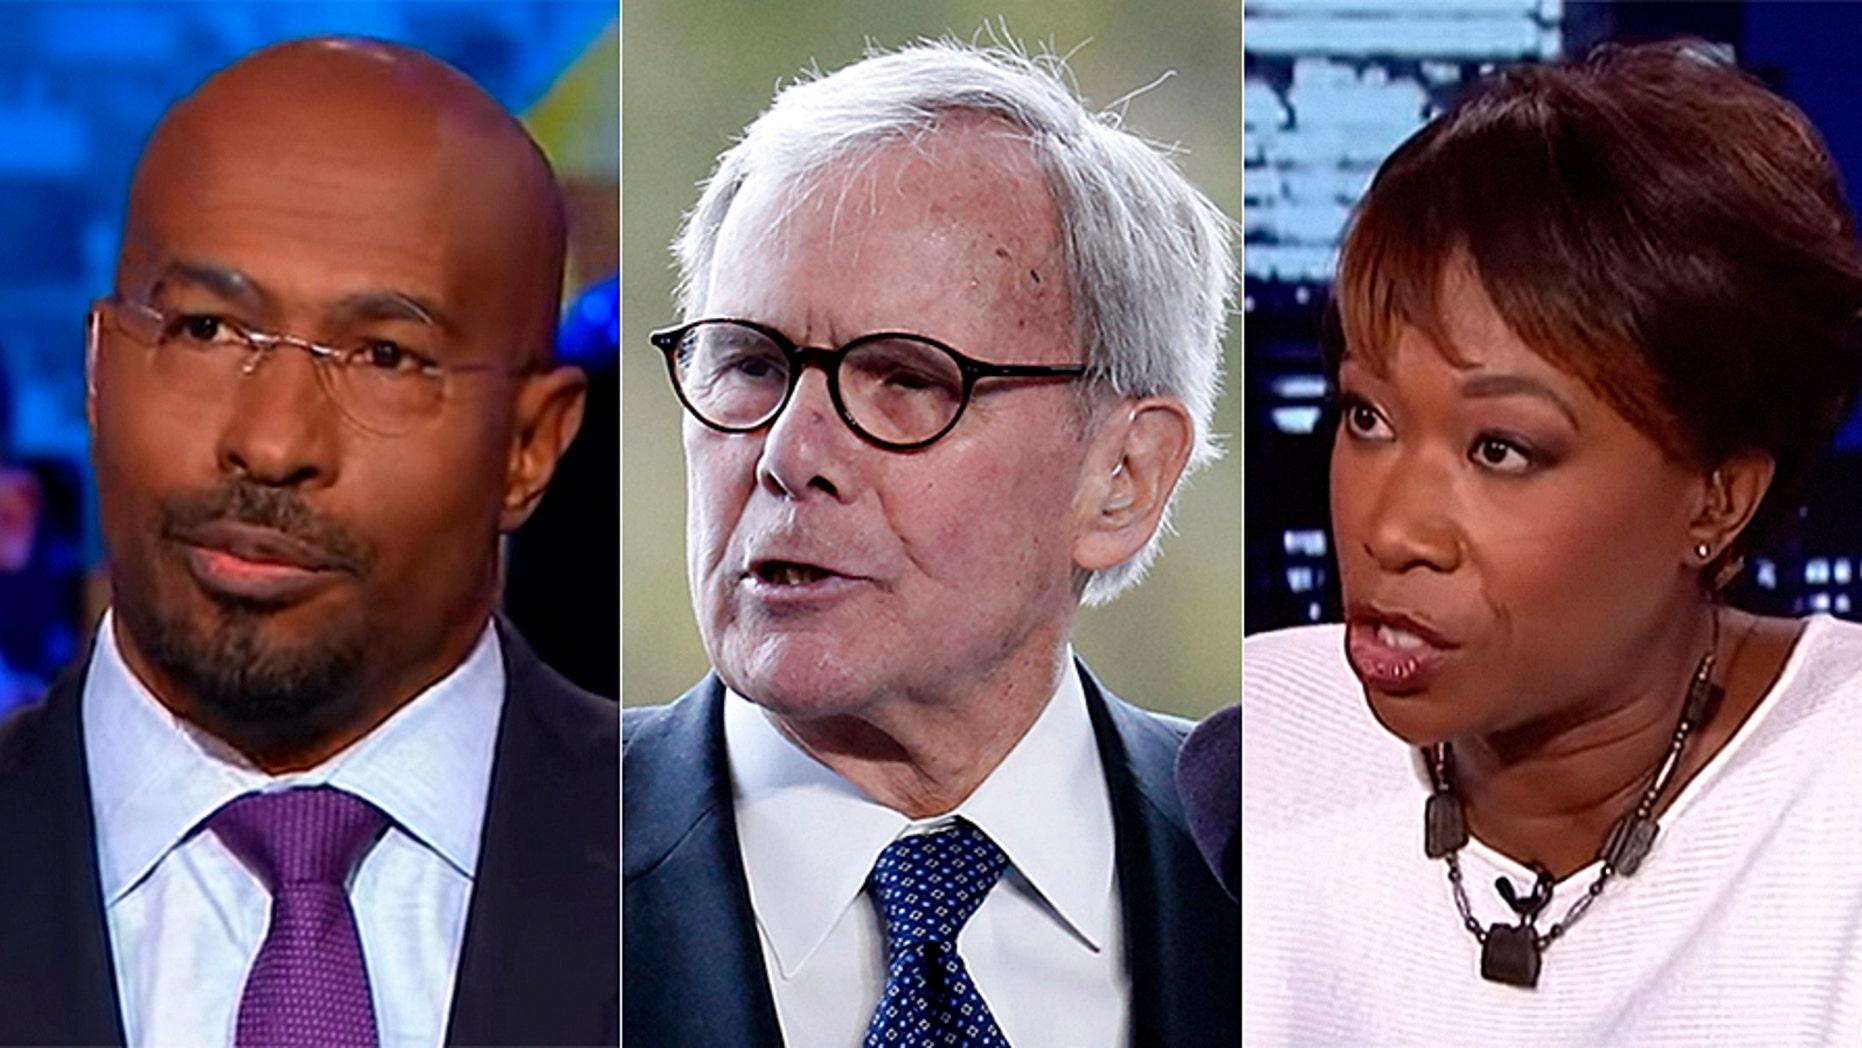 Van Jones, Tom Brokaw and Joy Reid were among the most triggered pundits on Tuesday night.